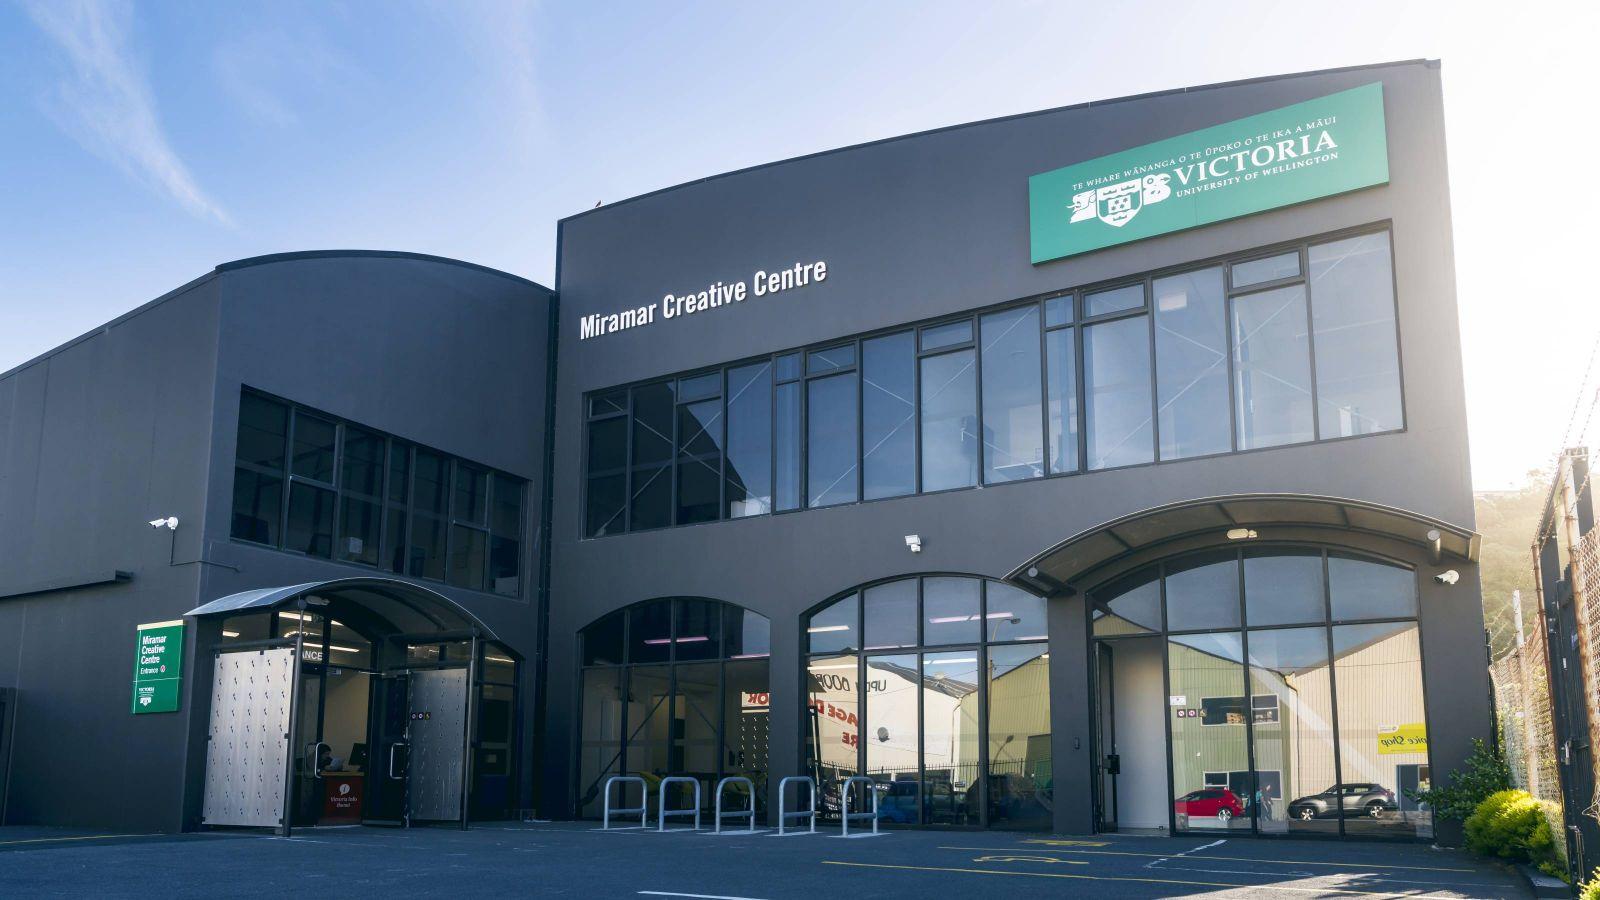 Miramar Creative Centre exterior building